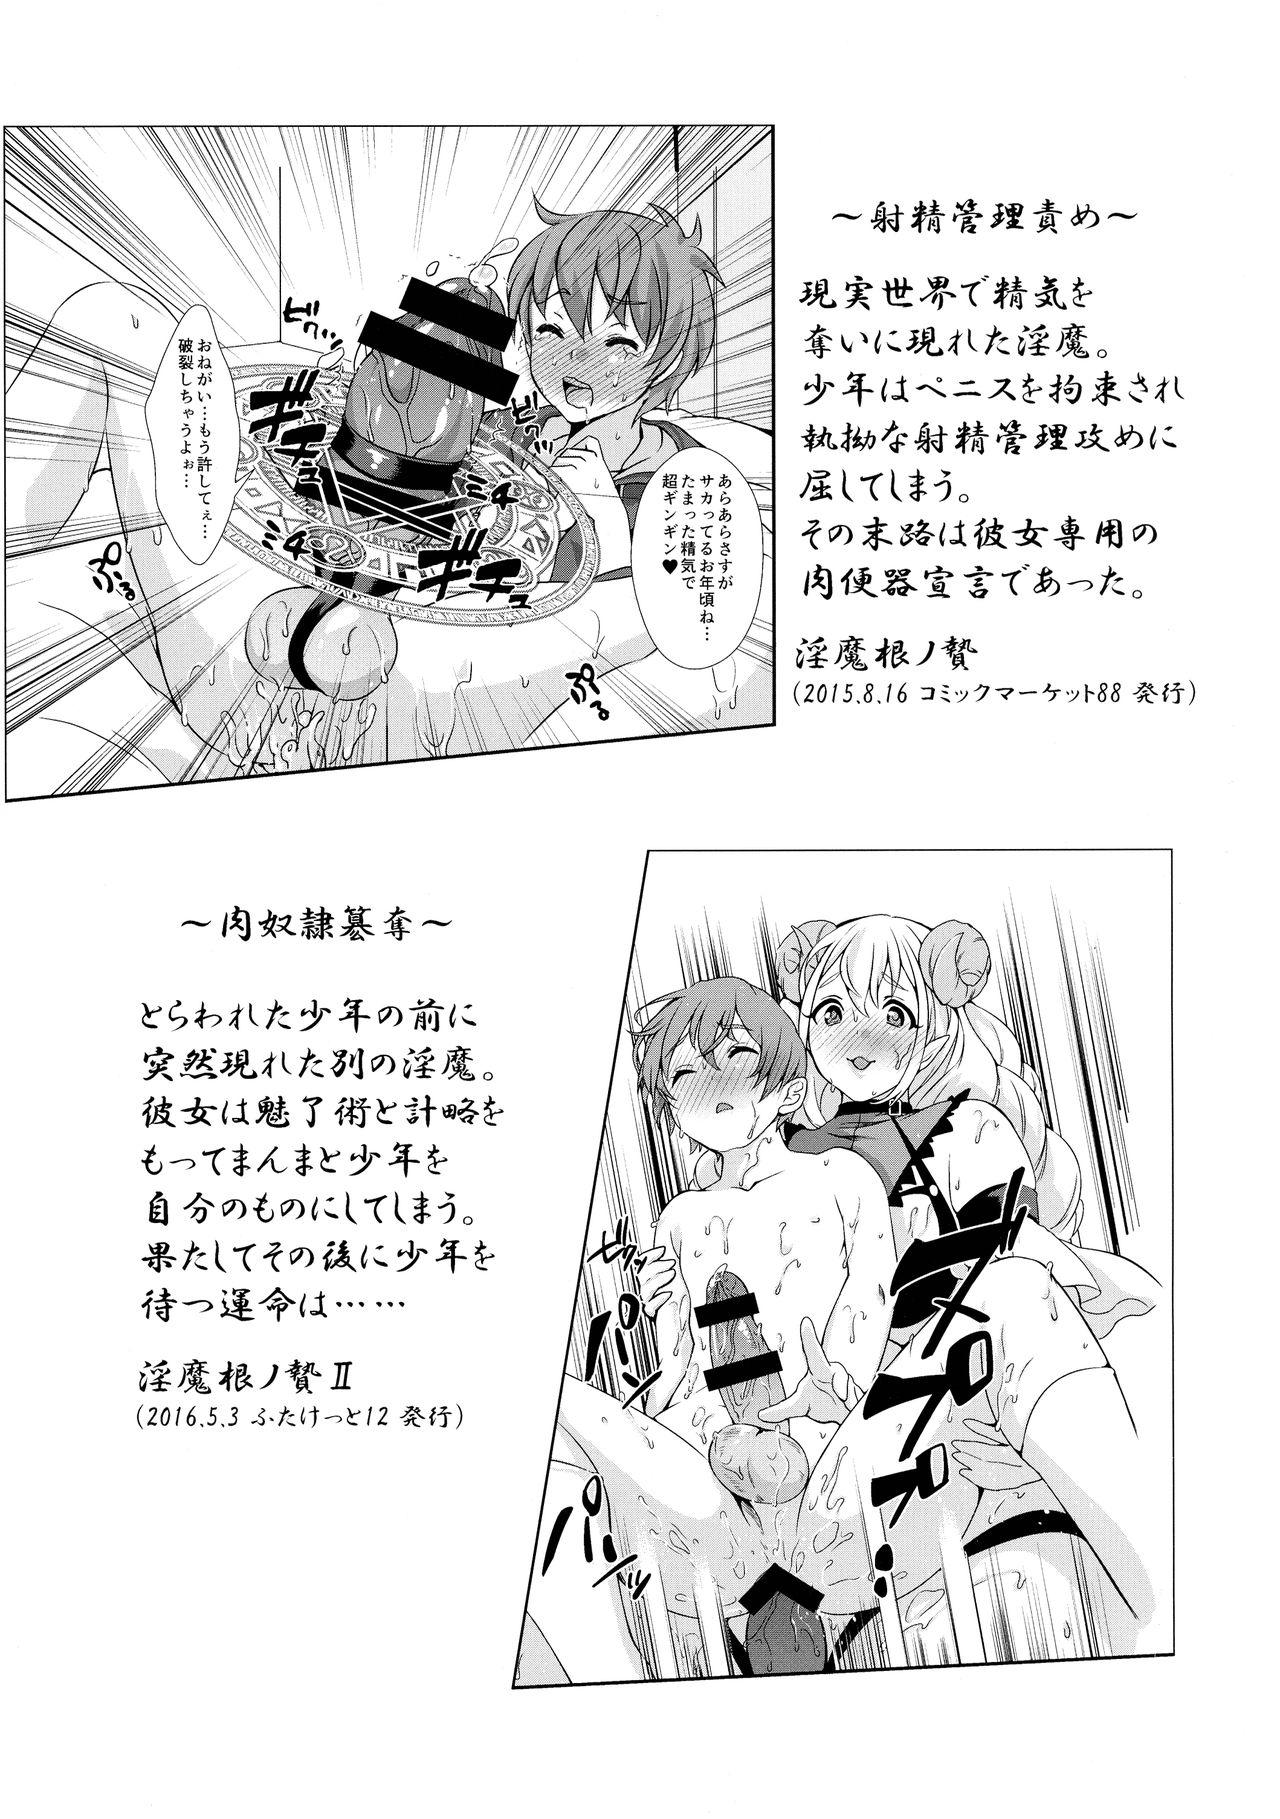 Immakon no Mie III 3